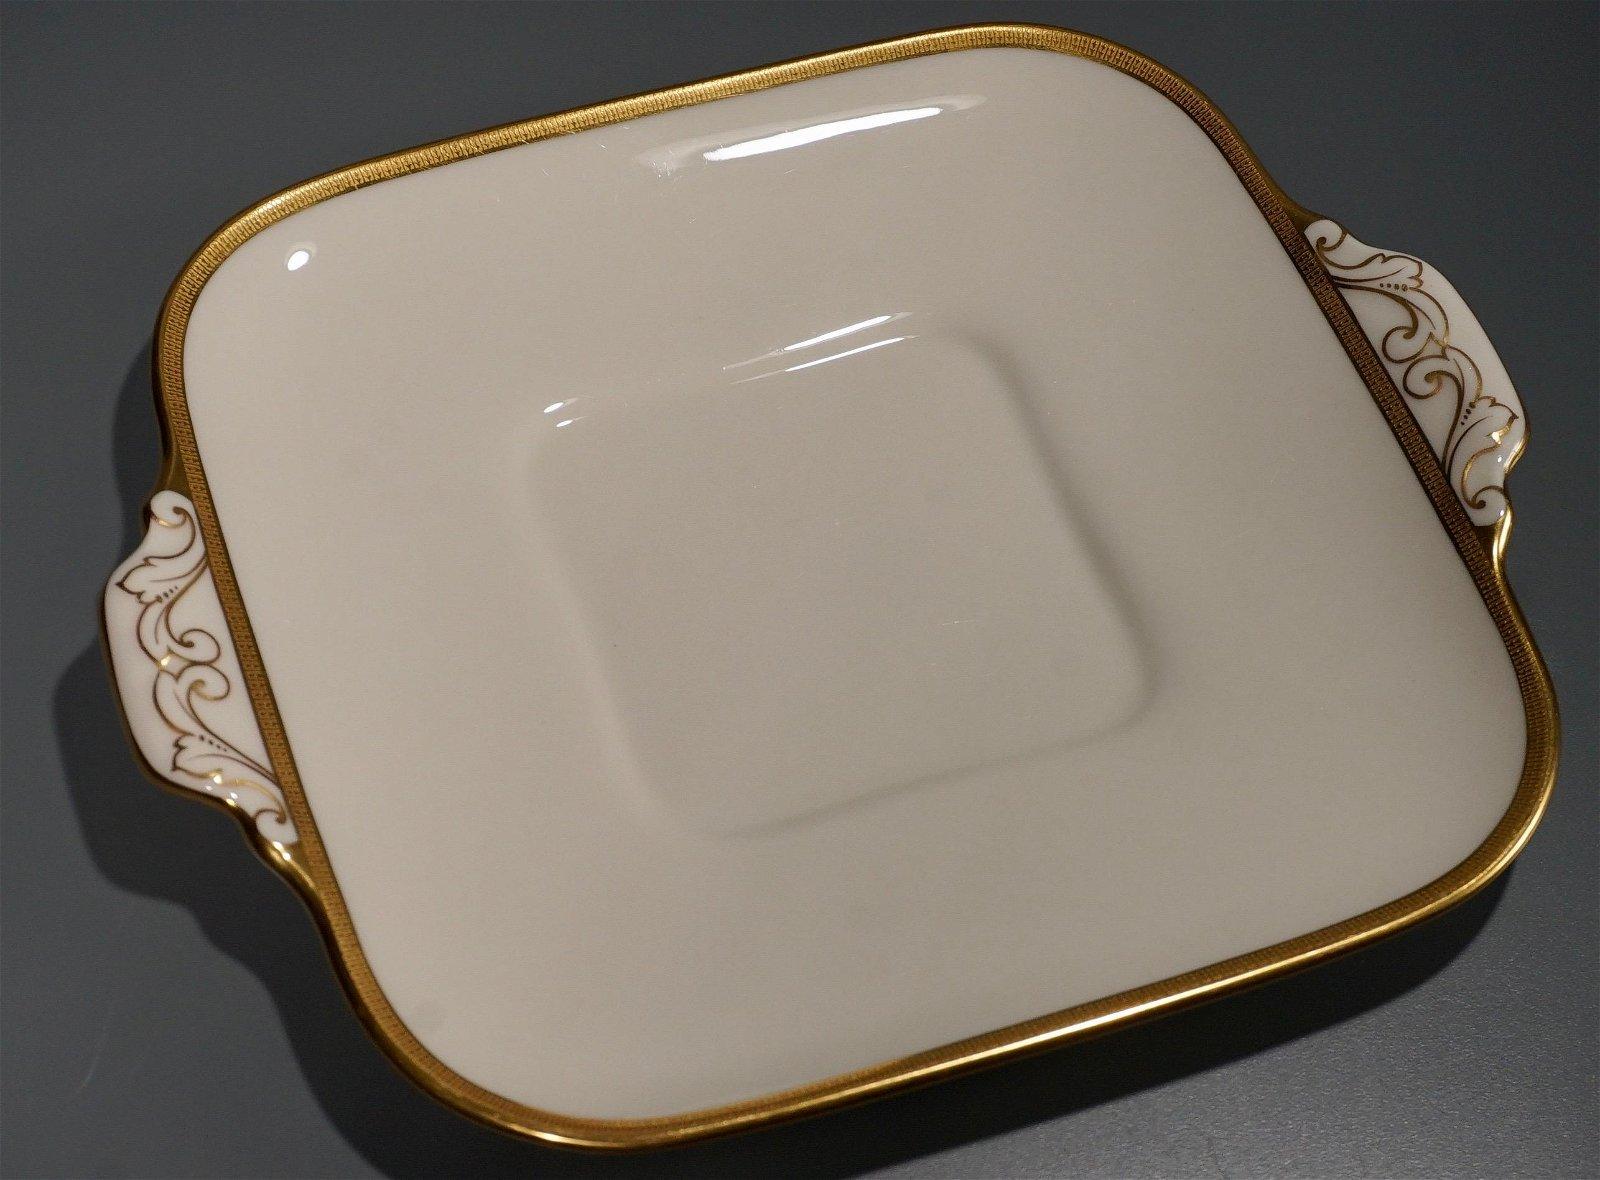 Lenox Porcelain Square Serving Platter Gold Handles